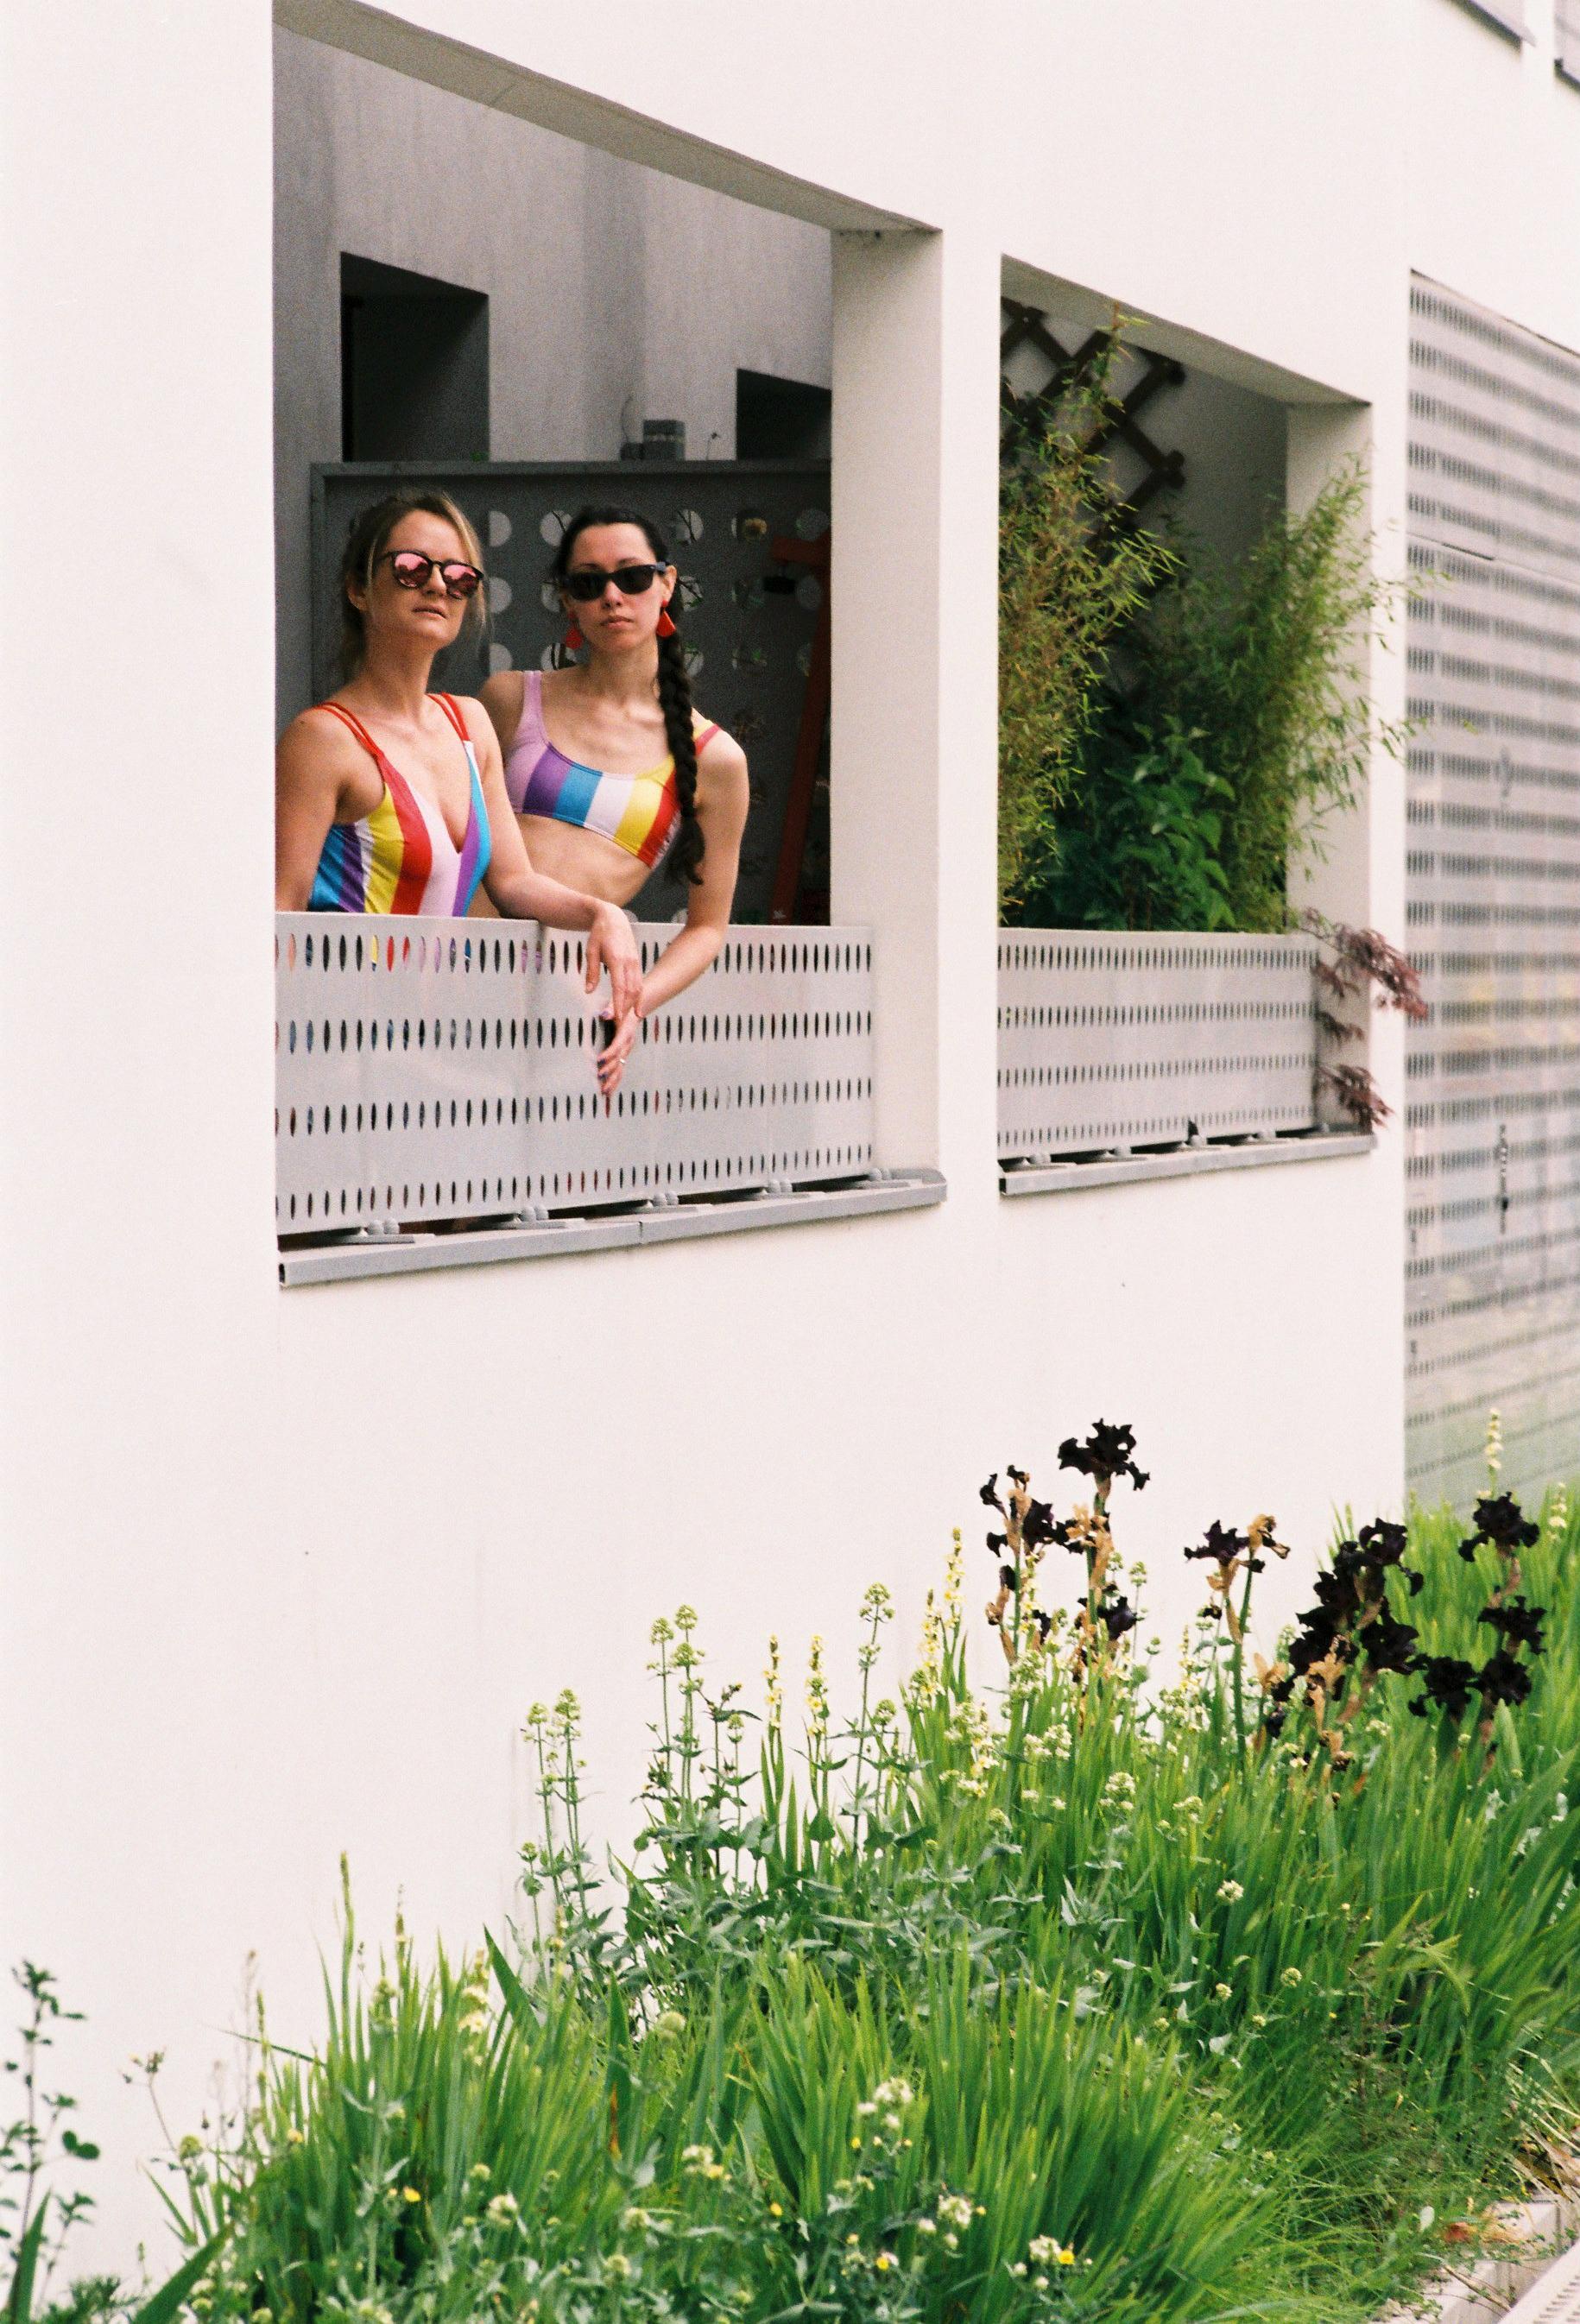 les rituelles edito maillots de bain swimwear vintage feel paris eshop lingerie_01 (1).jpg